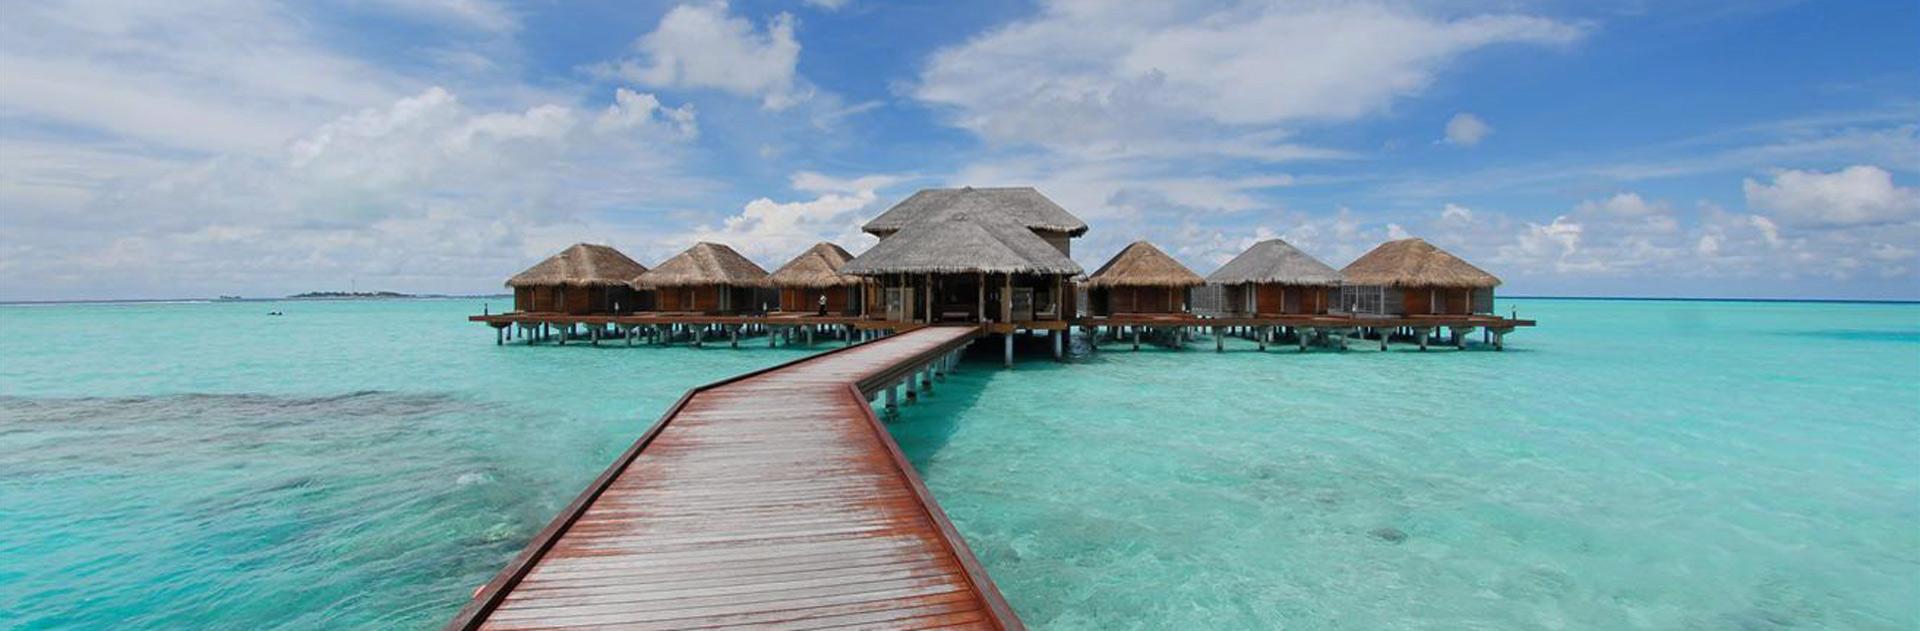 MV Anantara Dhigu Resort and Spa 9 días 2